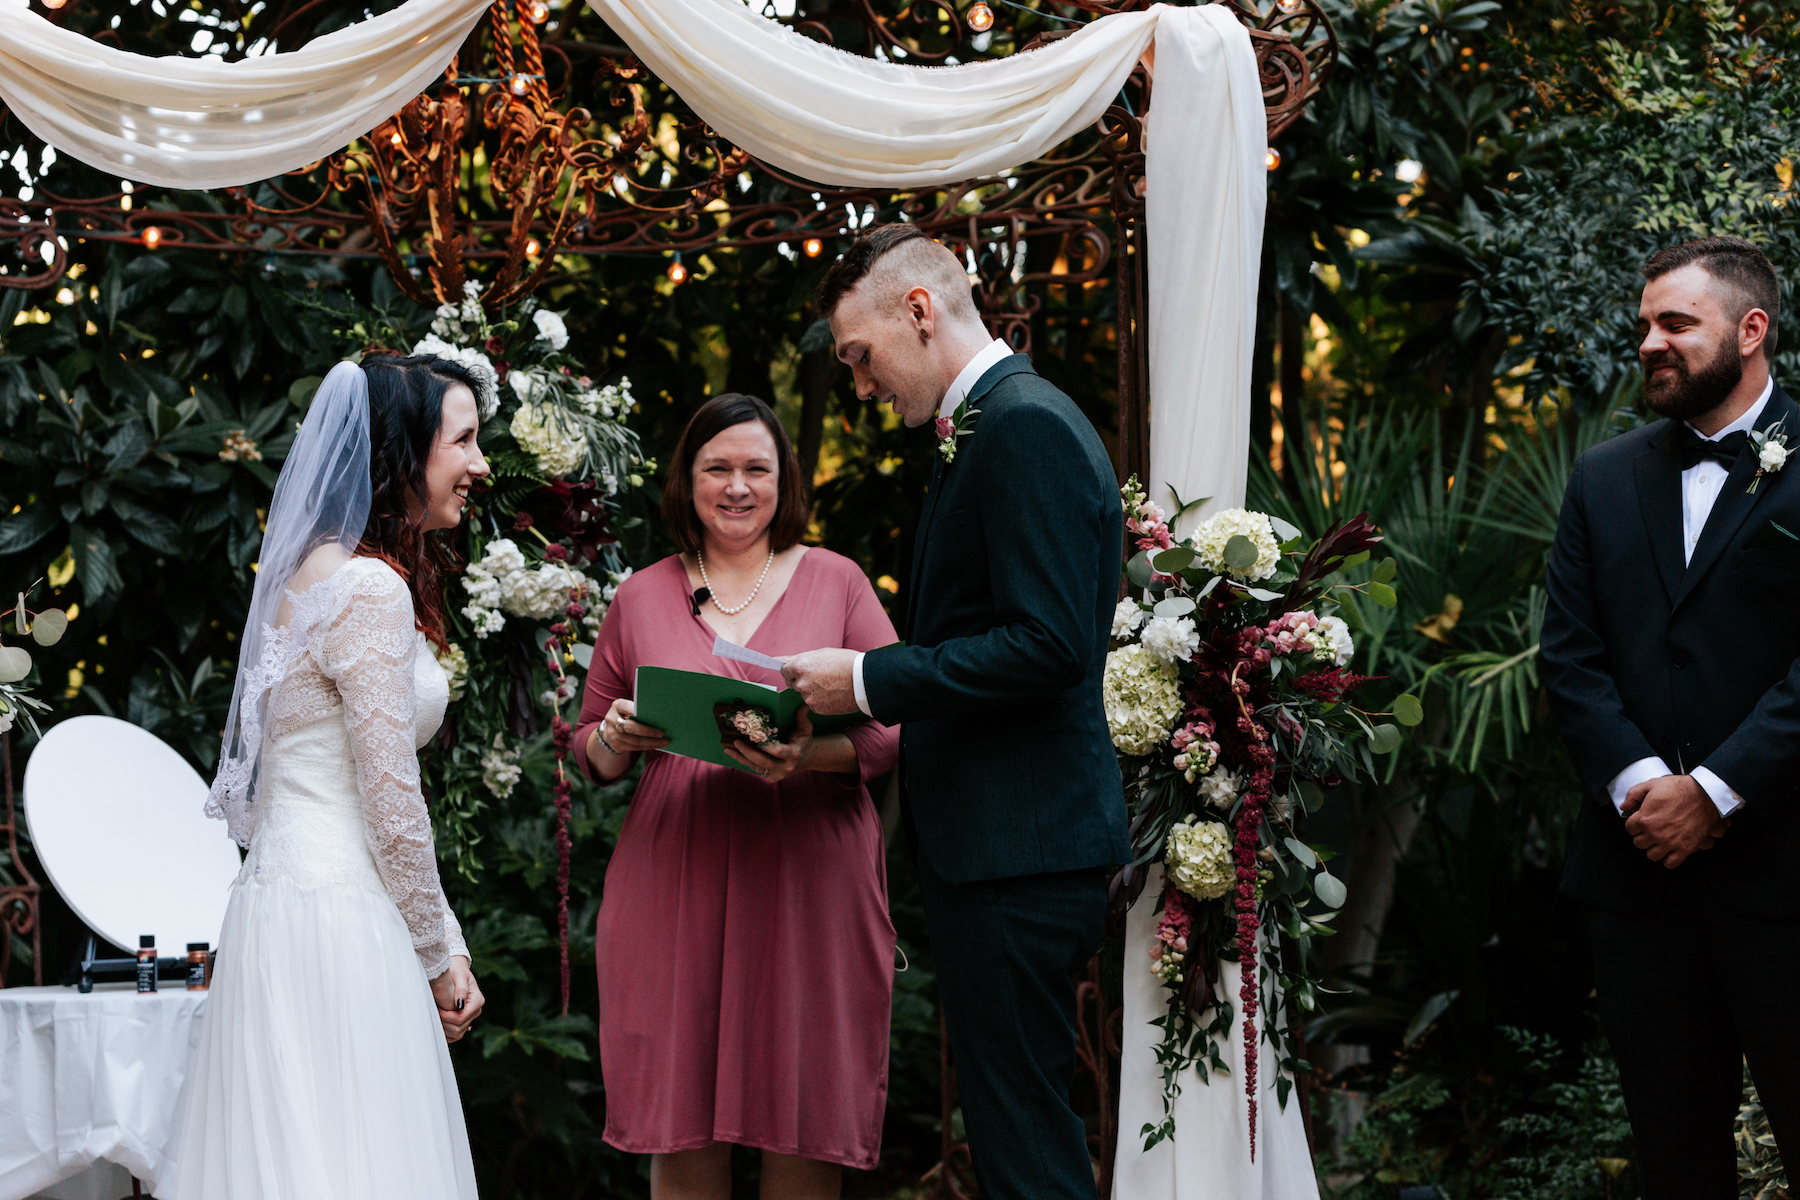 South-Carolina-Wedding-Engagement-Bridal-Photographer-Columbia-Greenville-Spartanburg-726.JPG